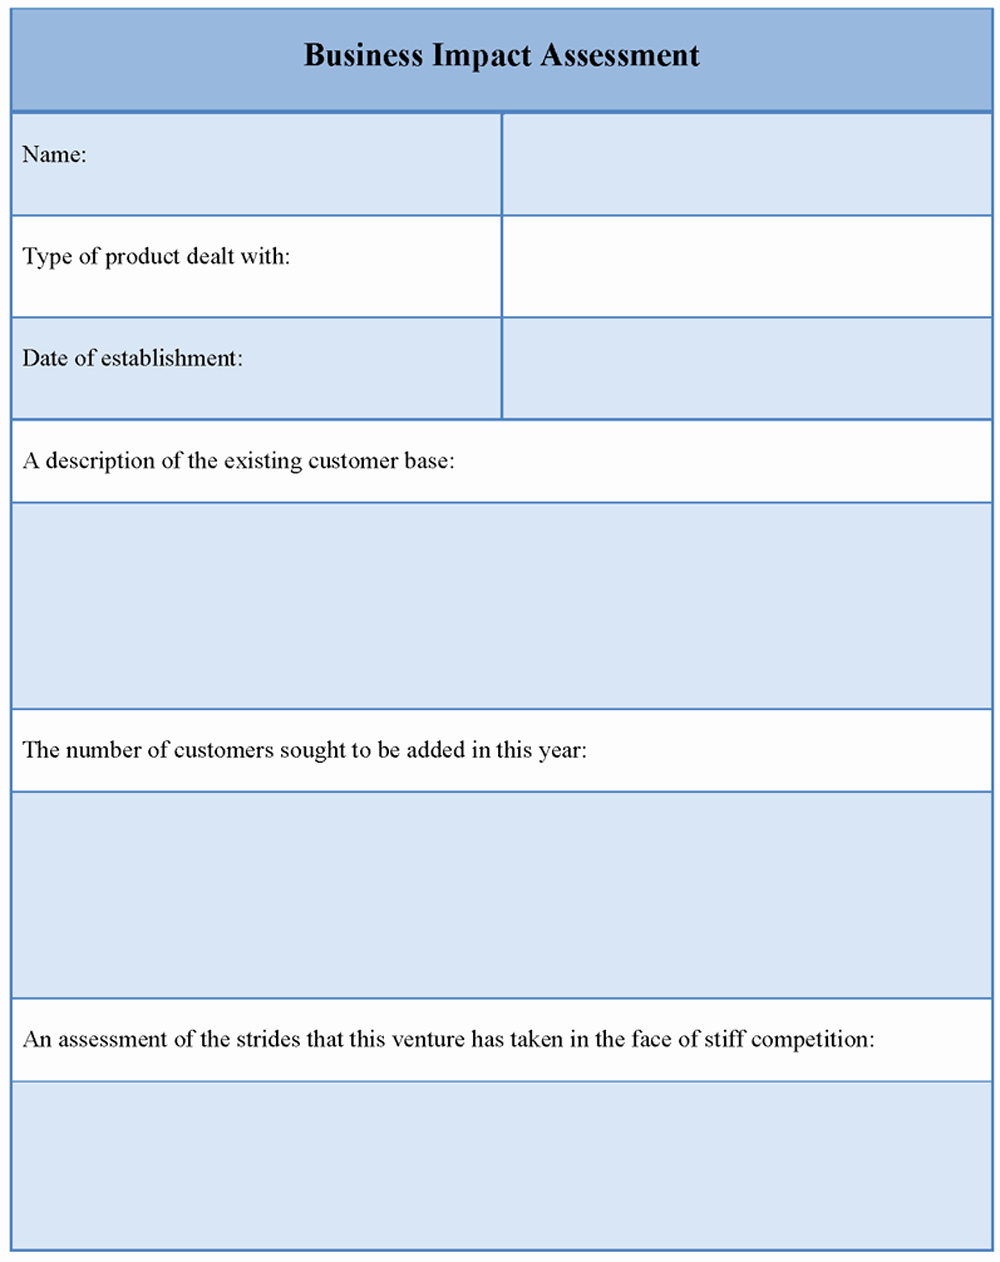 Business Needs assessment Template Luxury assessment Template for Business Impact Sample Of